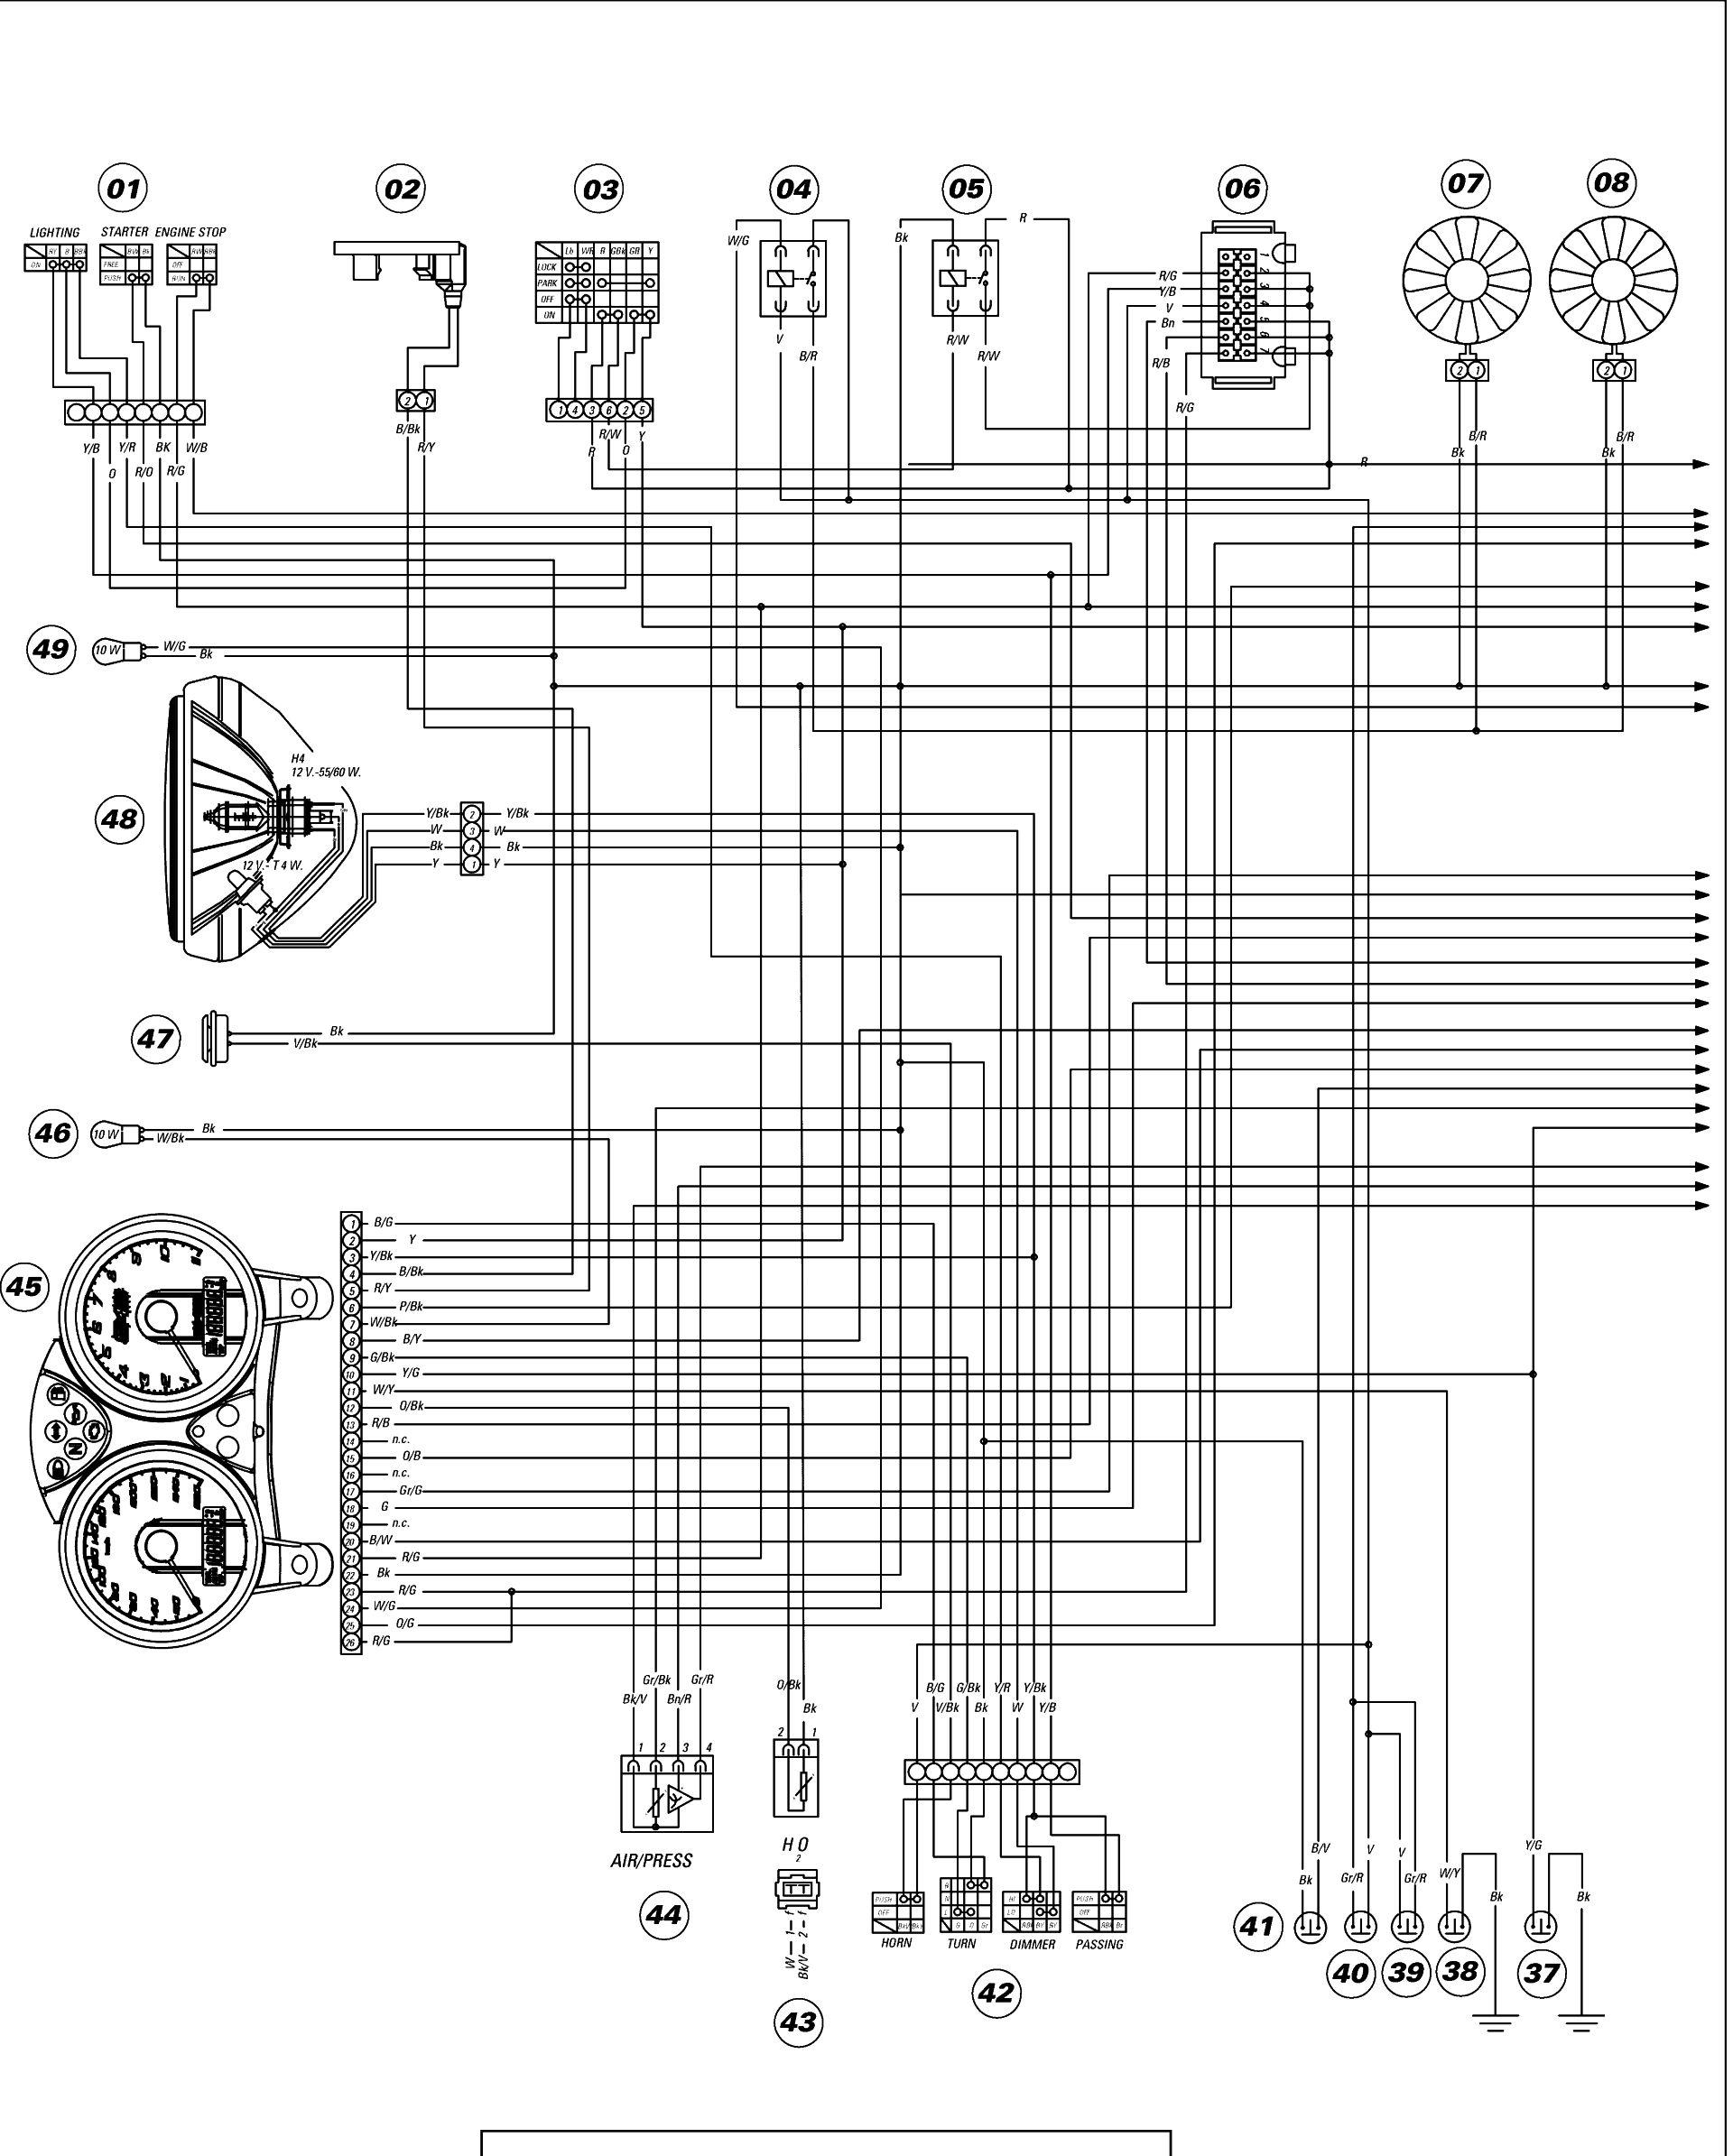 Peachy Ducati Monster S4R 2004 Wiring Diagram Wiring Diagram Data Schema Wiring Digital Resources Remcakbiperorg